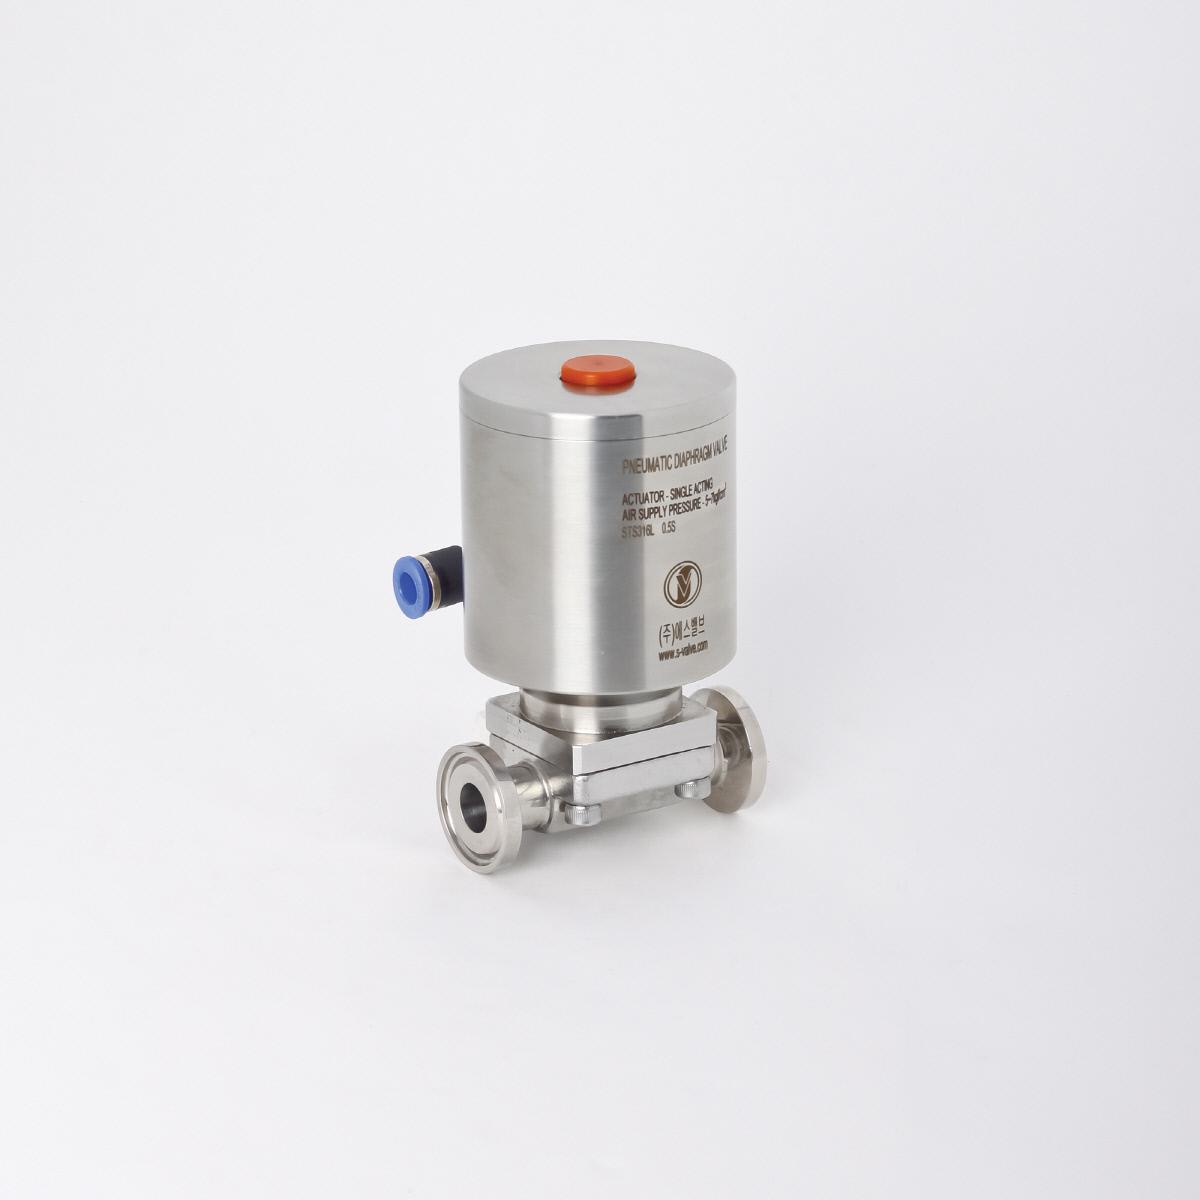 S-valve_0030.jpg